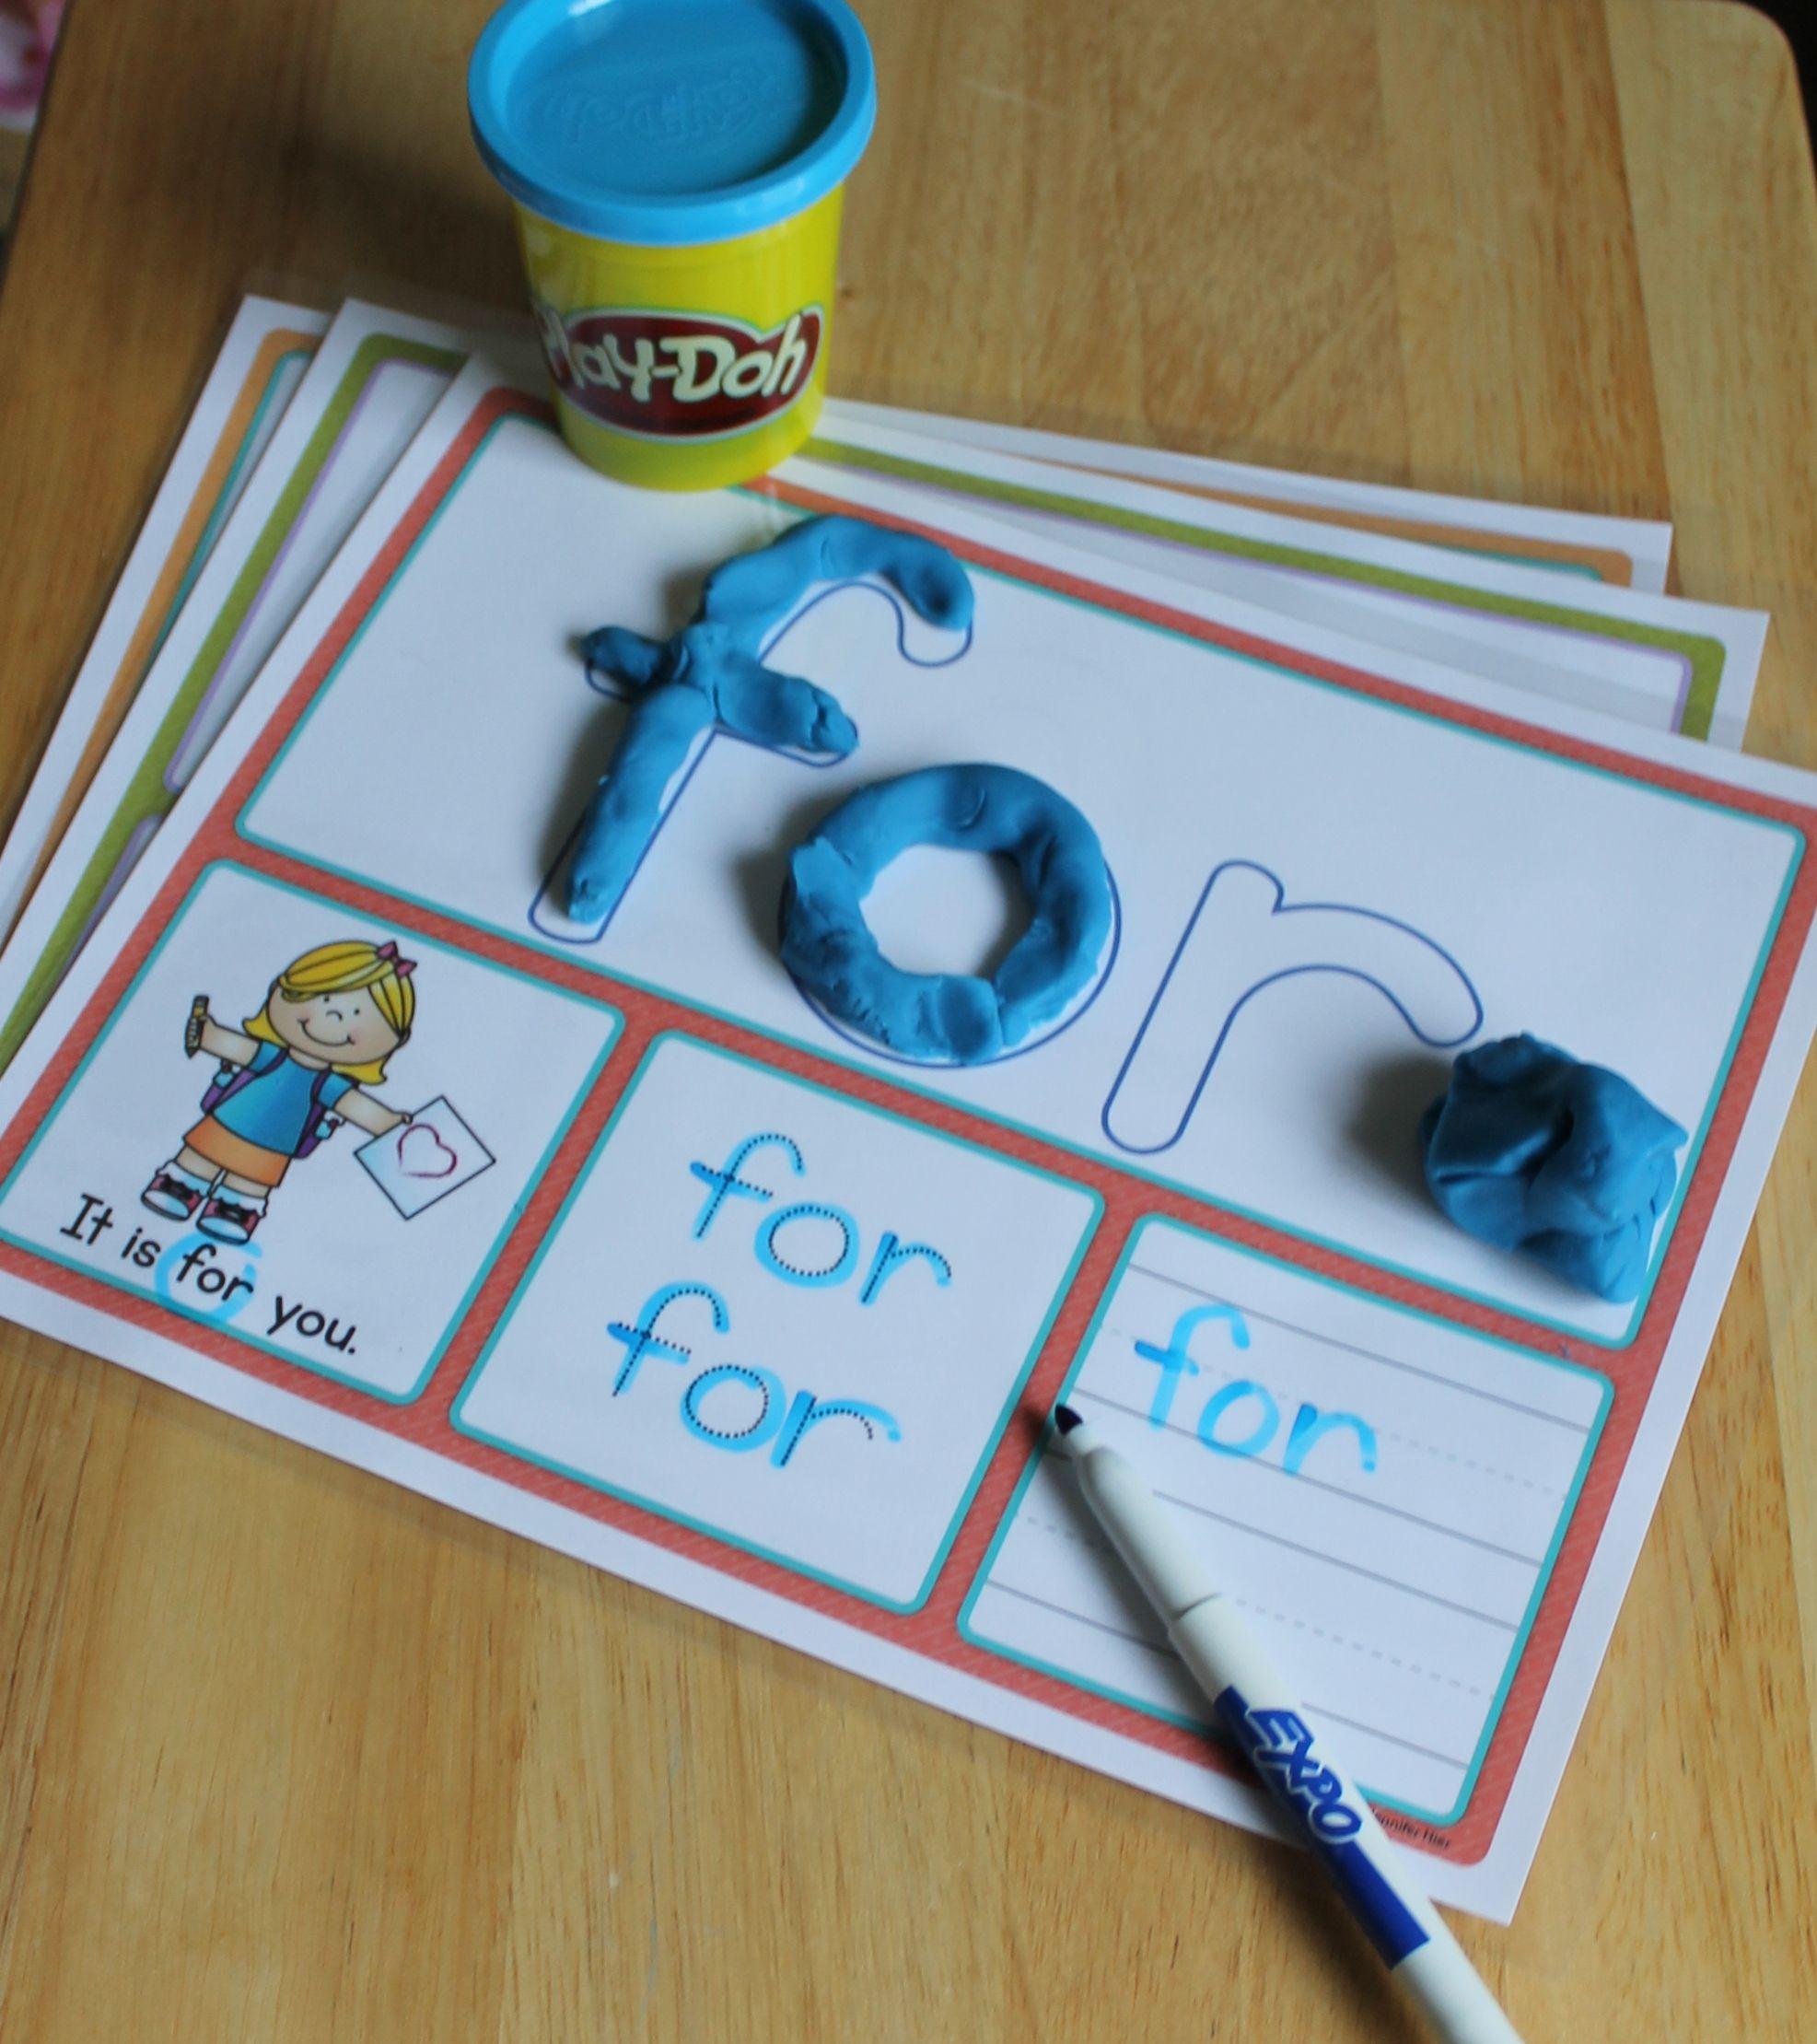 Fry List 1 Sight Word Play Dough Activity Mats   Kind, Schule und Klasse